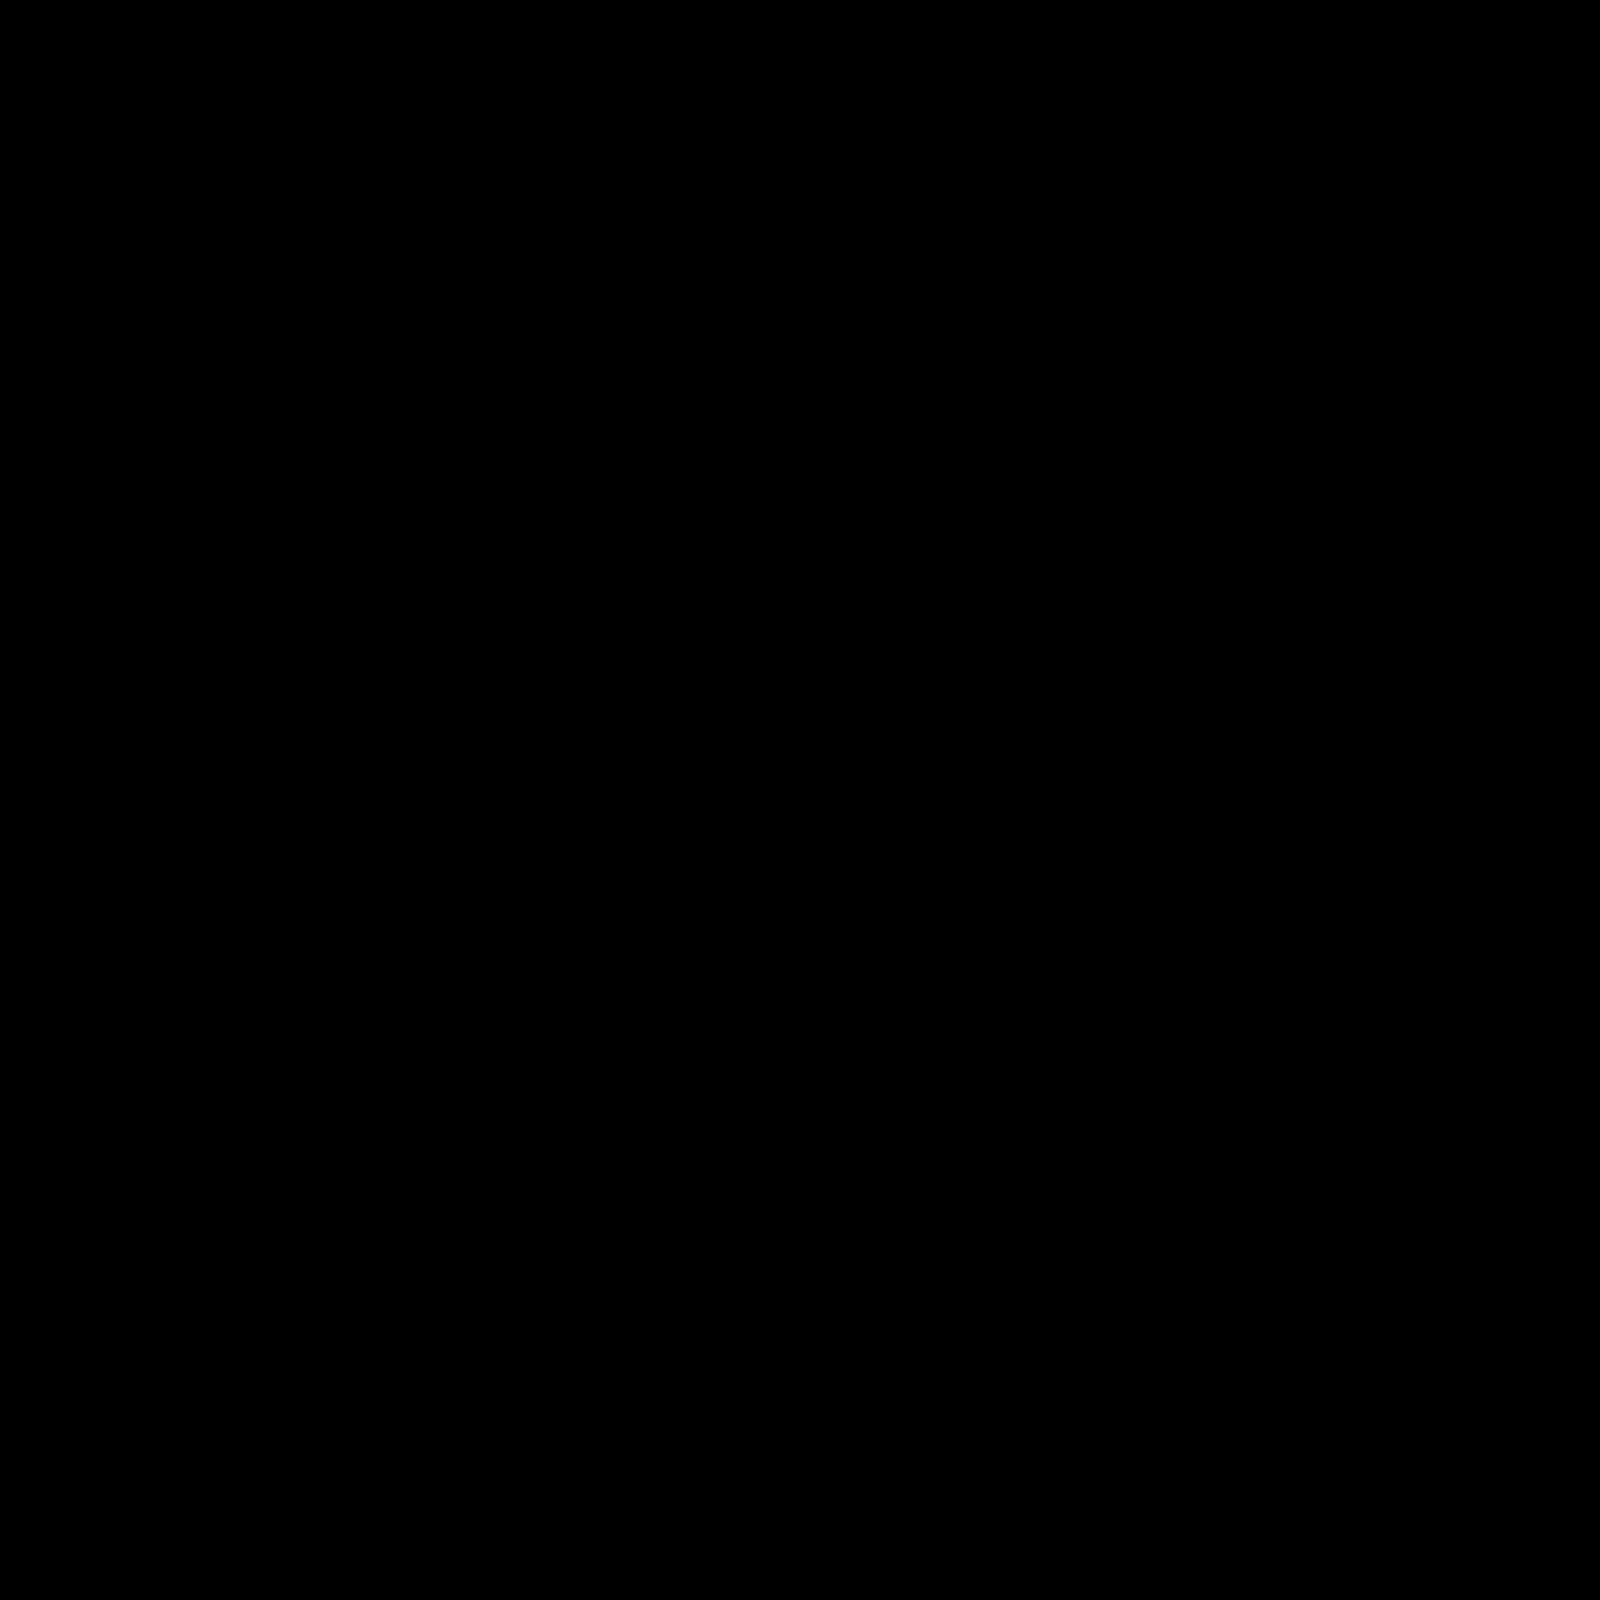 Parallel Workflow icon